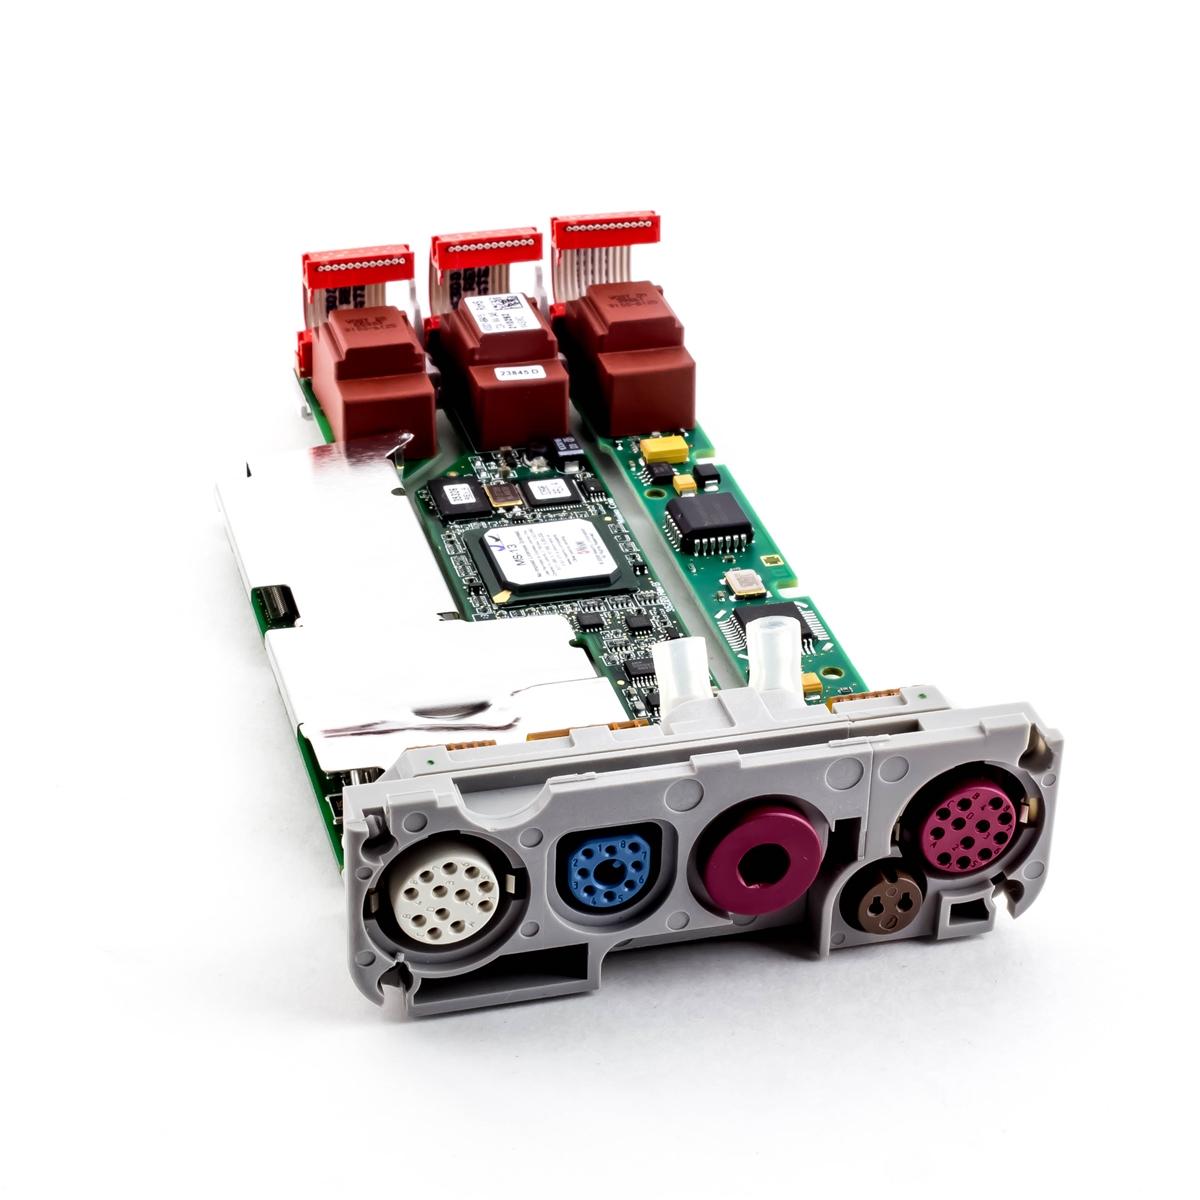 Philips IntelliVue M3001A MMS Module Parameter Boards A03C06 Masimo SET SpO2 NiBP 5 Lead ECG IBP Temp